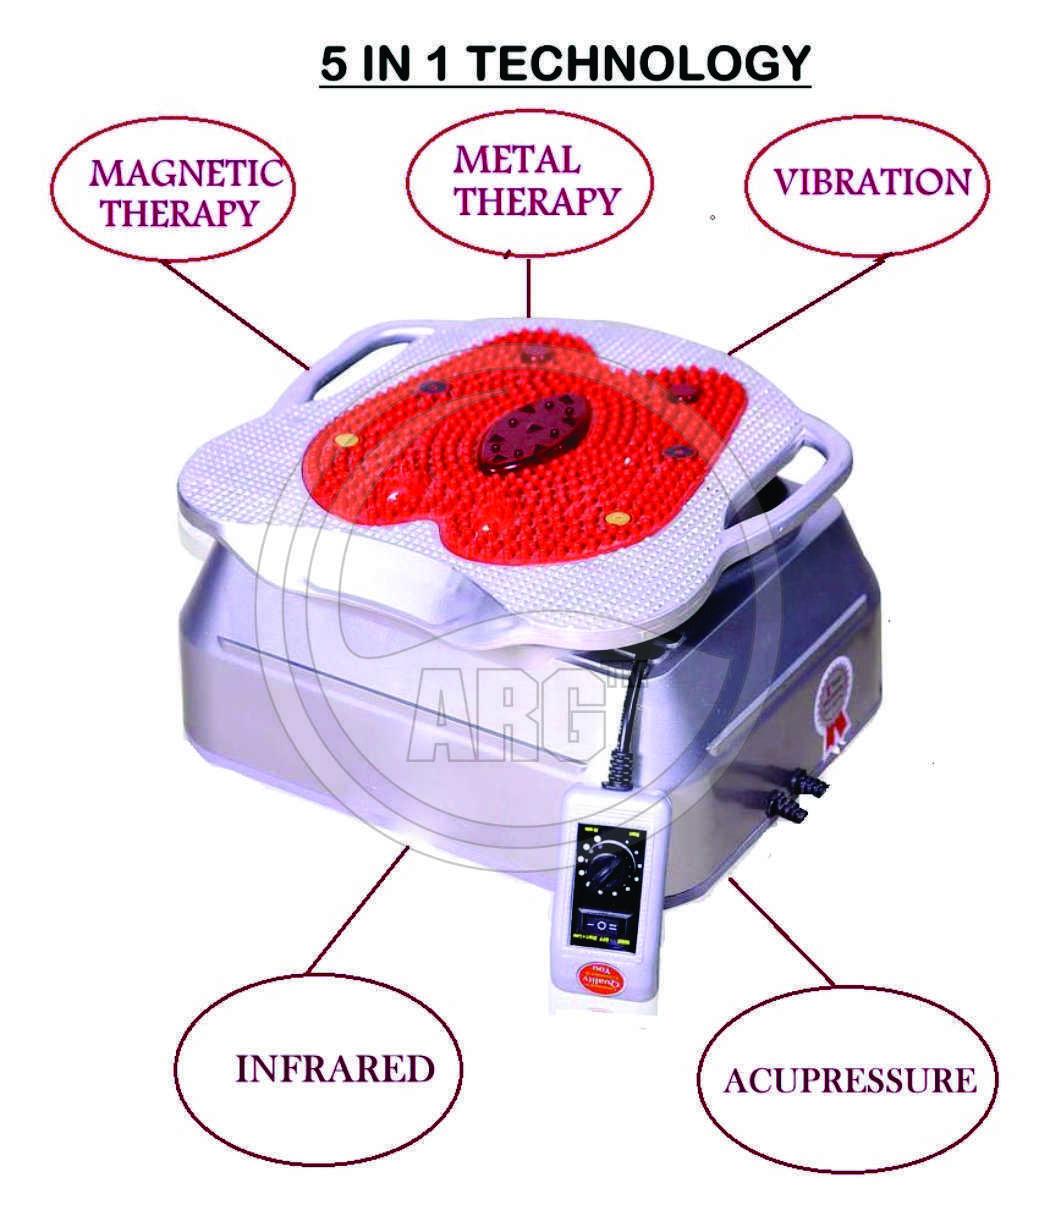 Blood Circulation Machine (BCM) - Energy